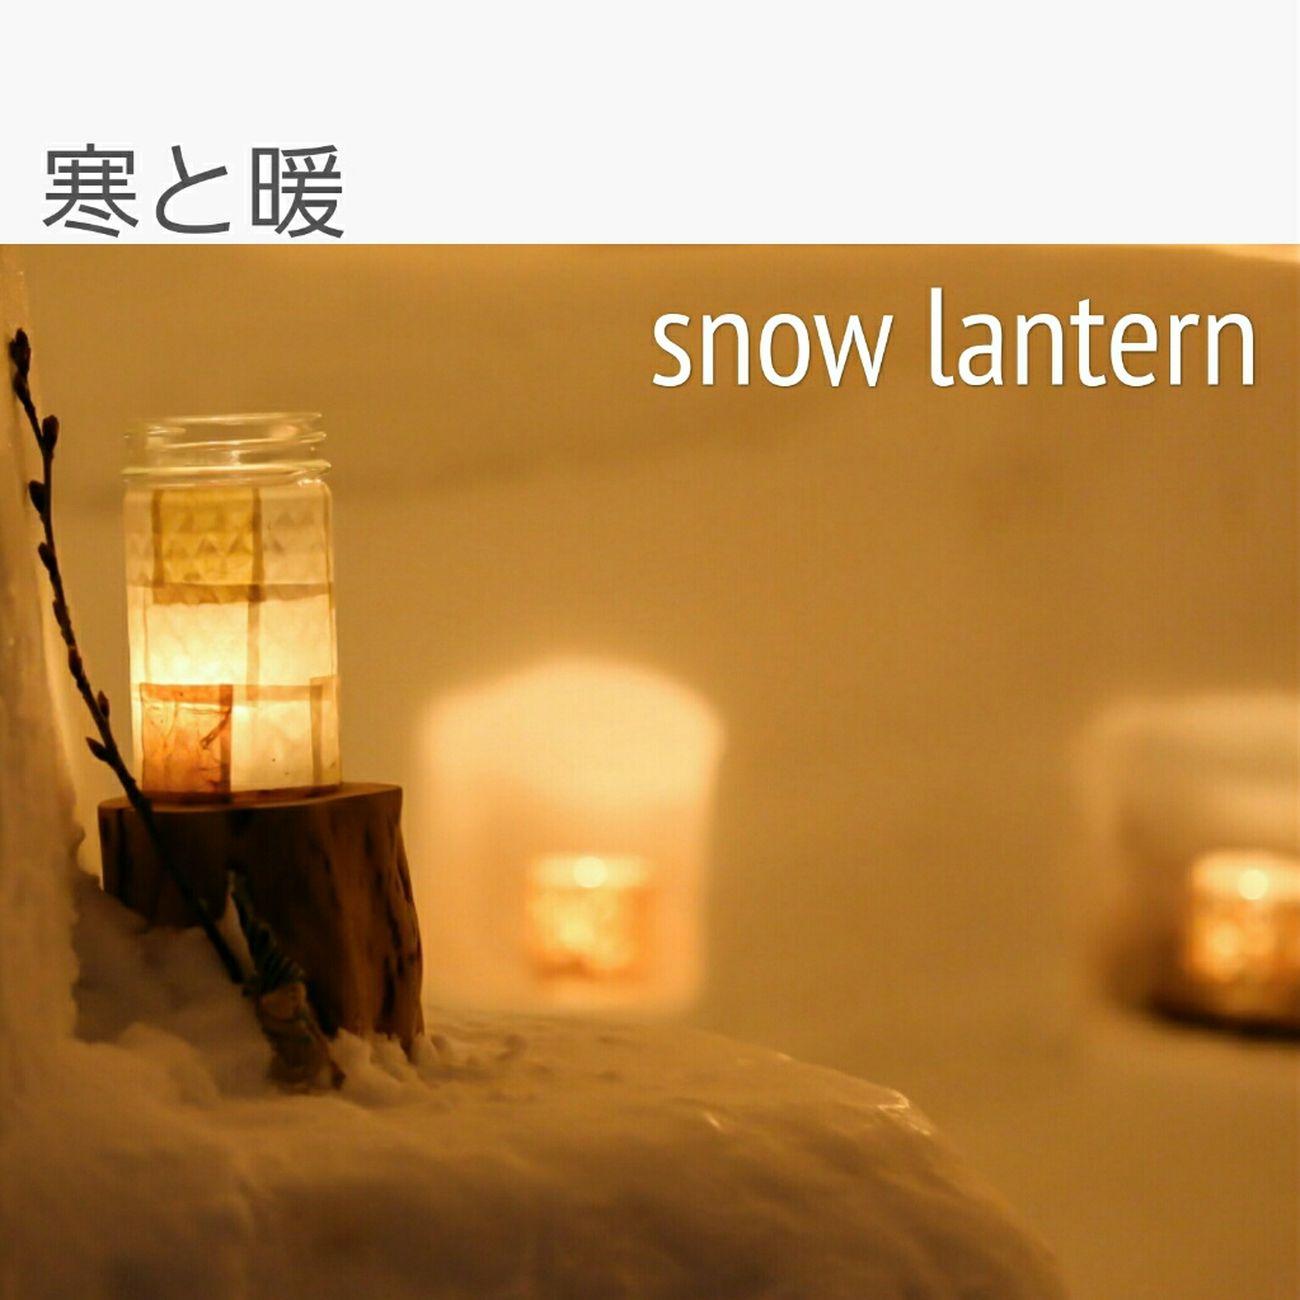 Snowfestival Snow Lantern Winter Light And Shadow EyeEm Nature Lover Nature 月山志津温泉雪旅籠の灯り